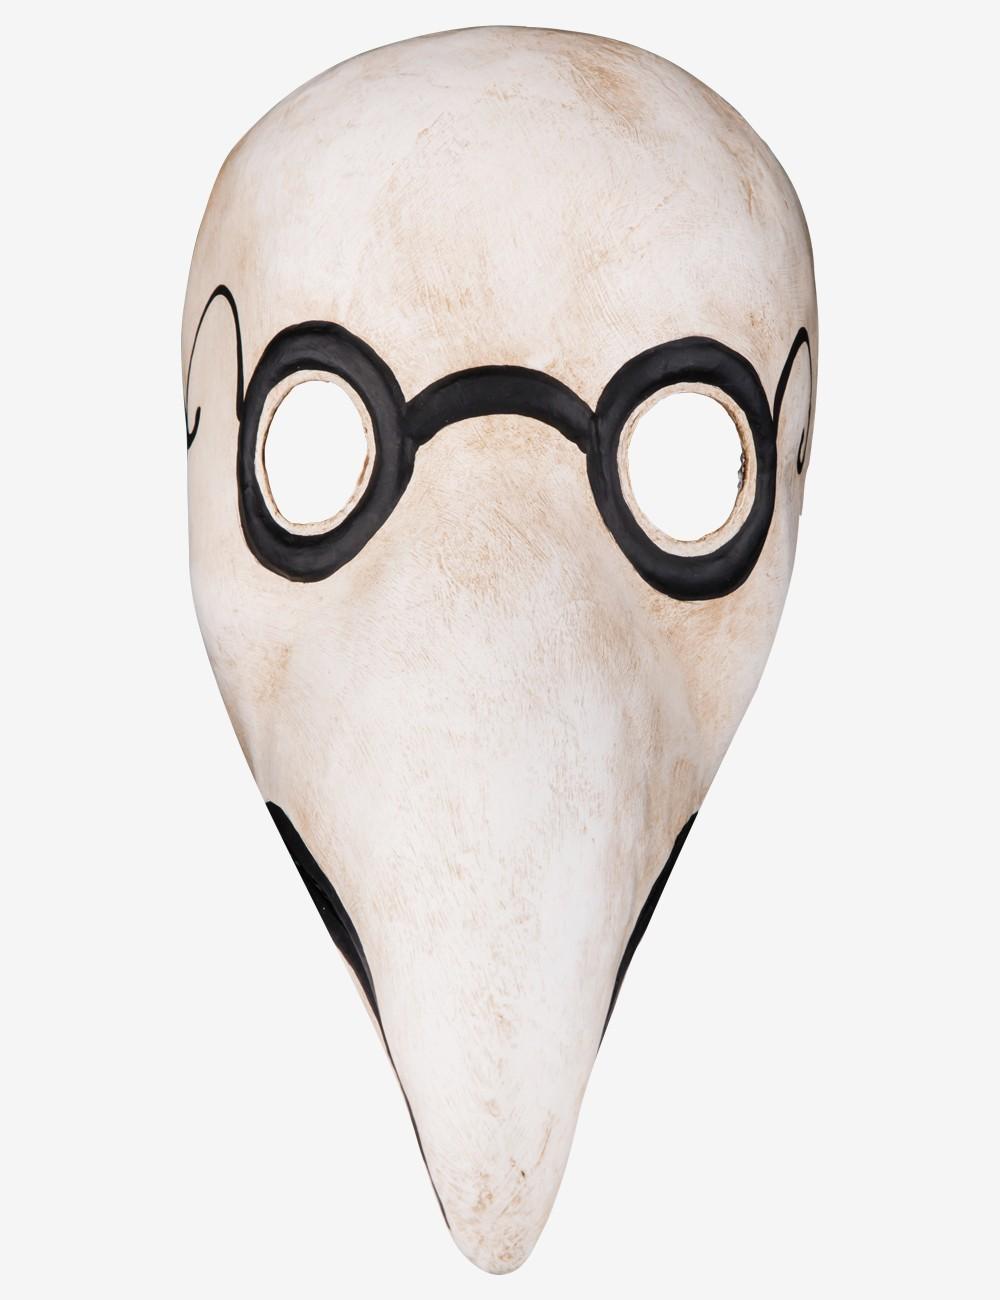 Maschera Medico della Peste - Vista Frontale